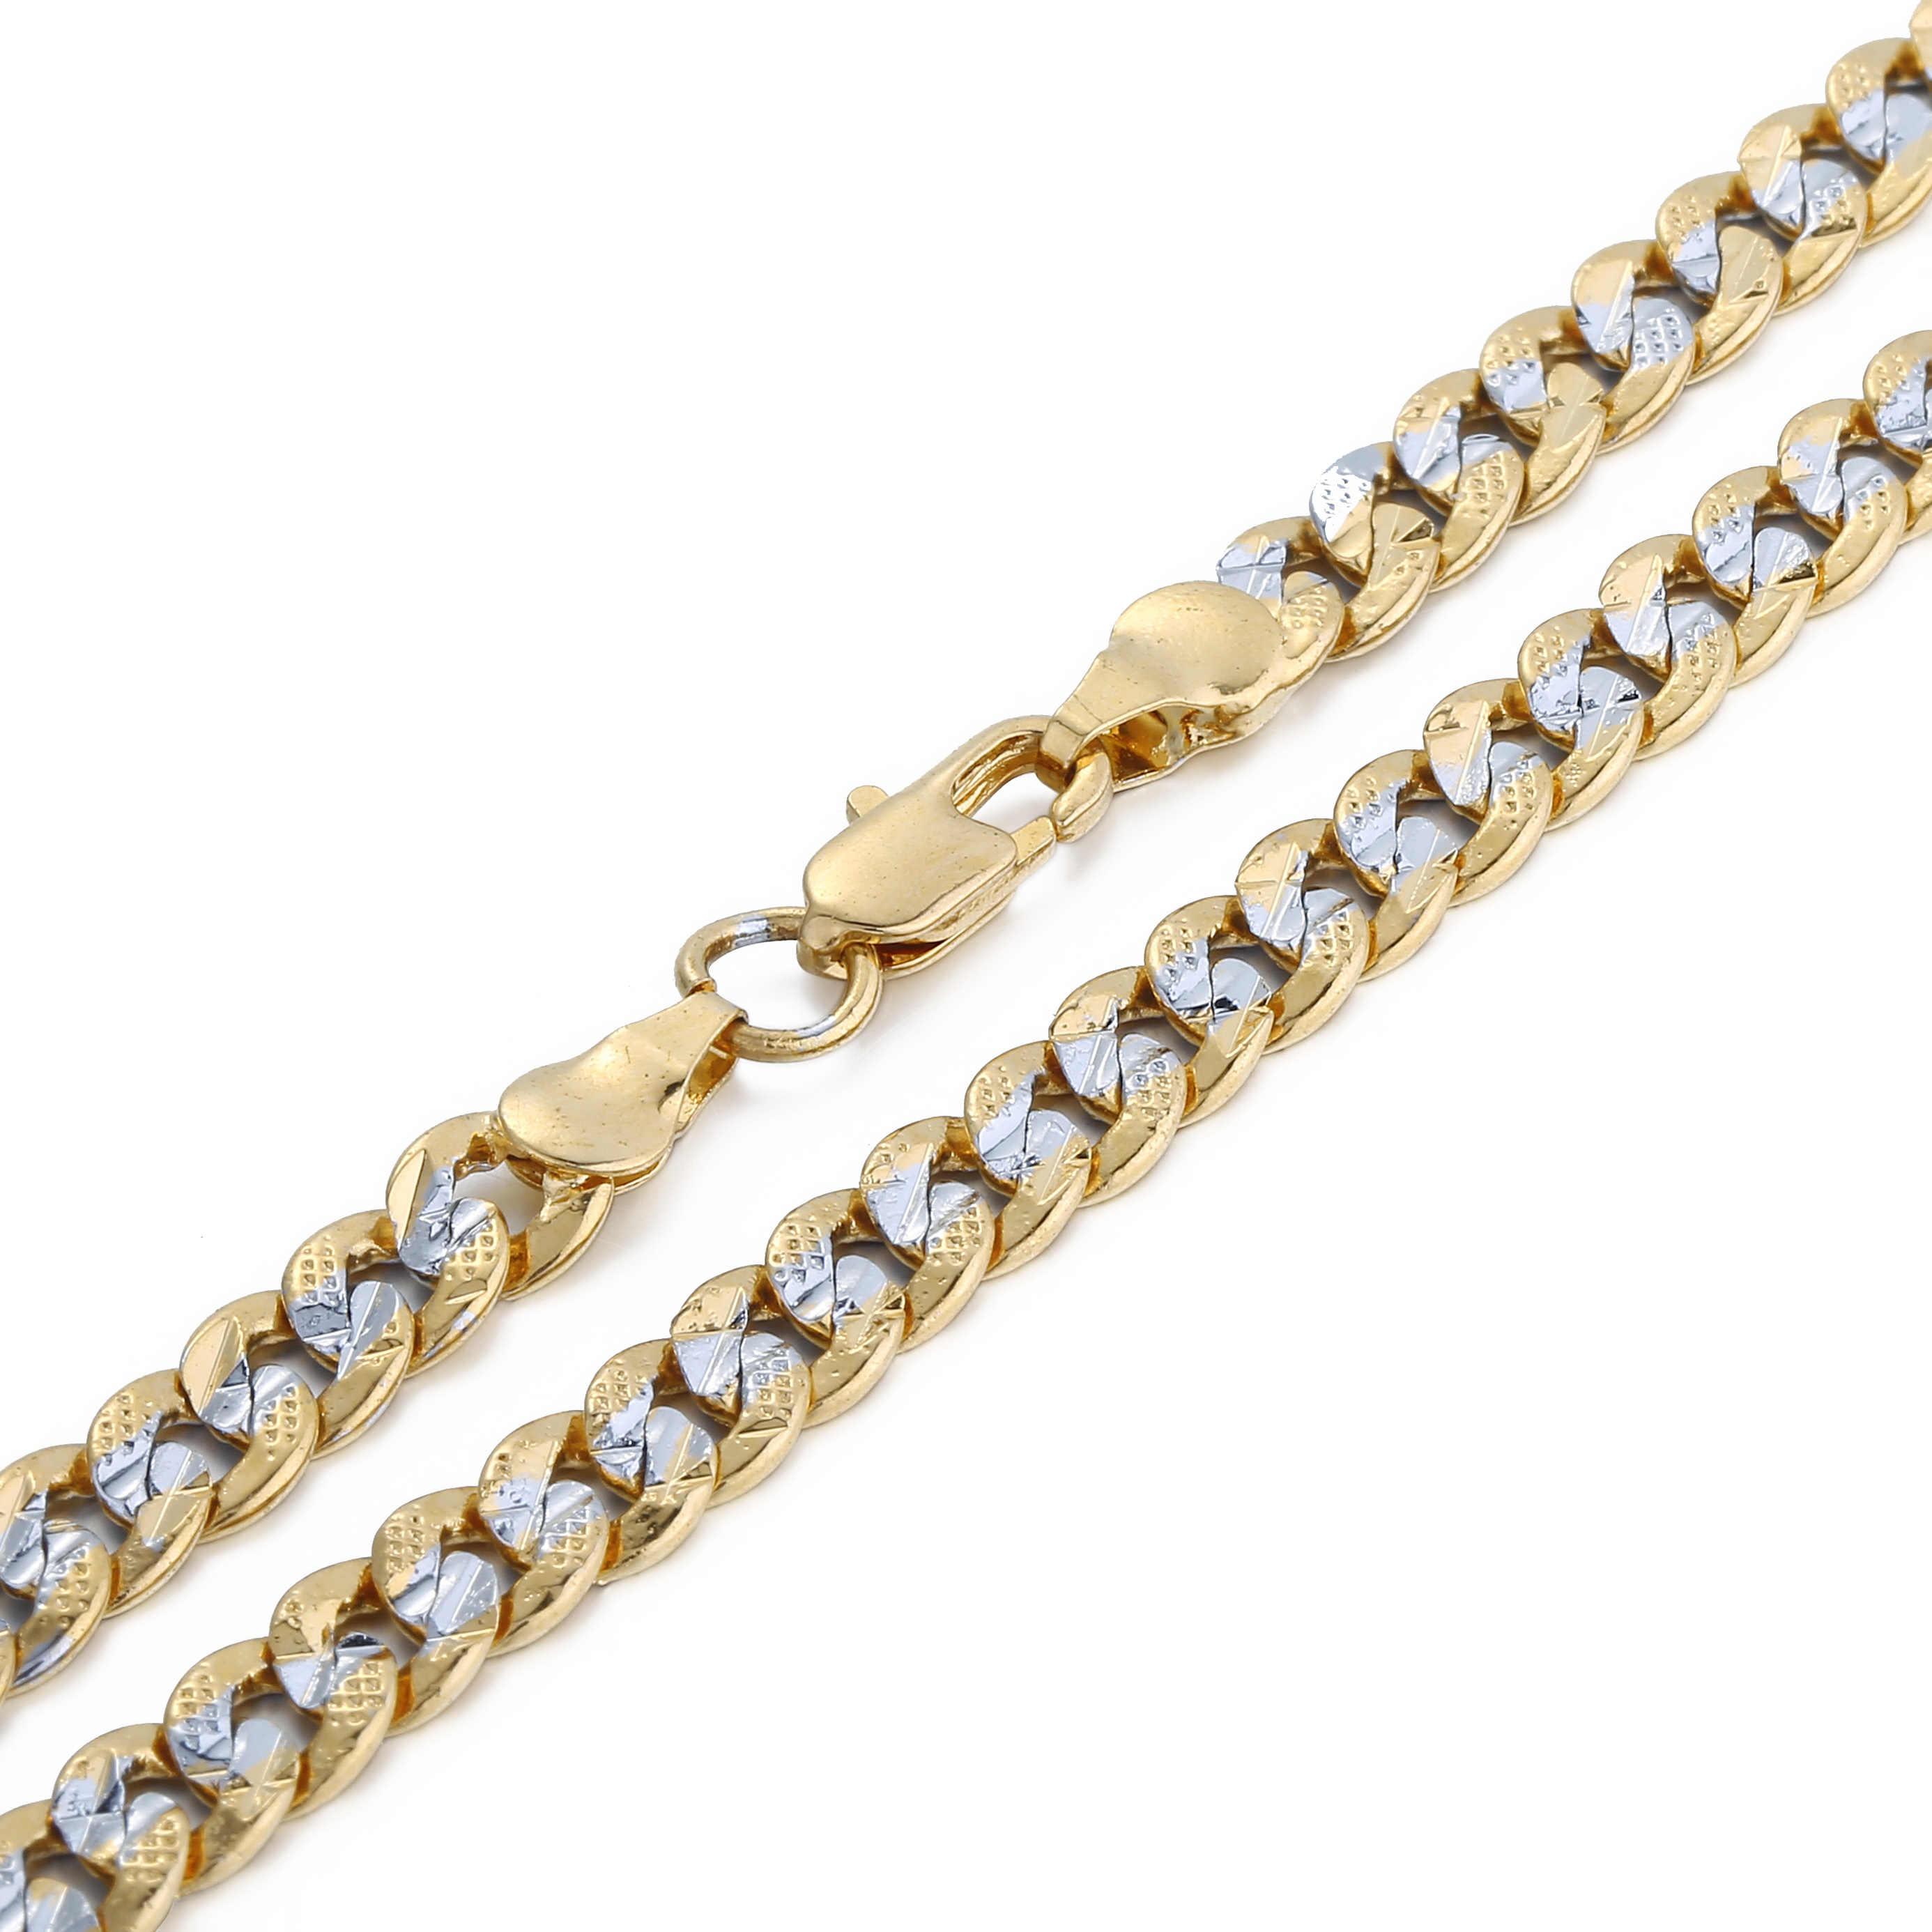 Trendsmax גברים של שרשרת זהב קובני קישור שרשרת שרשרת זכר תכשיטי 2018 סיטונאי Dropshipping מתנות 6mm KGN275